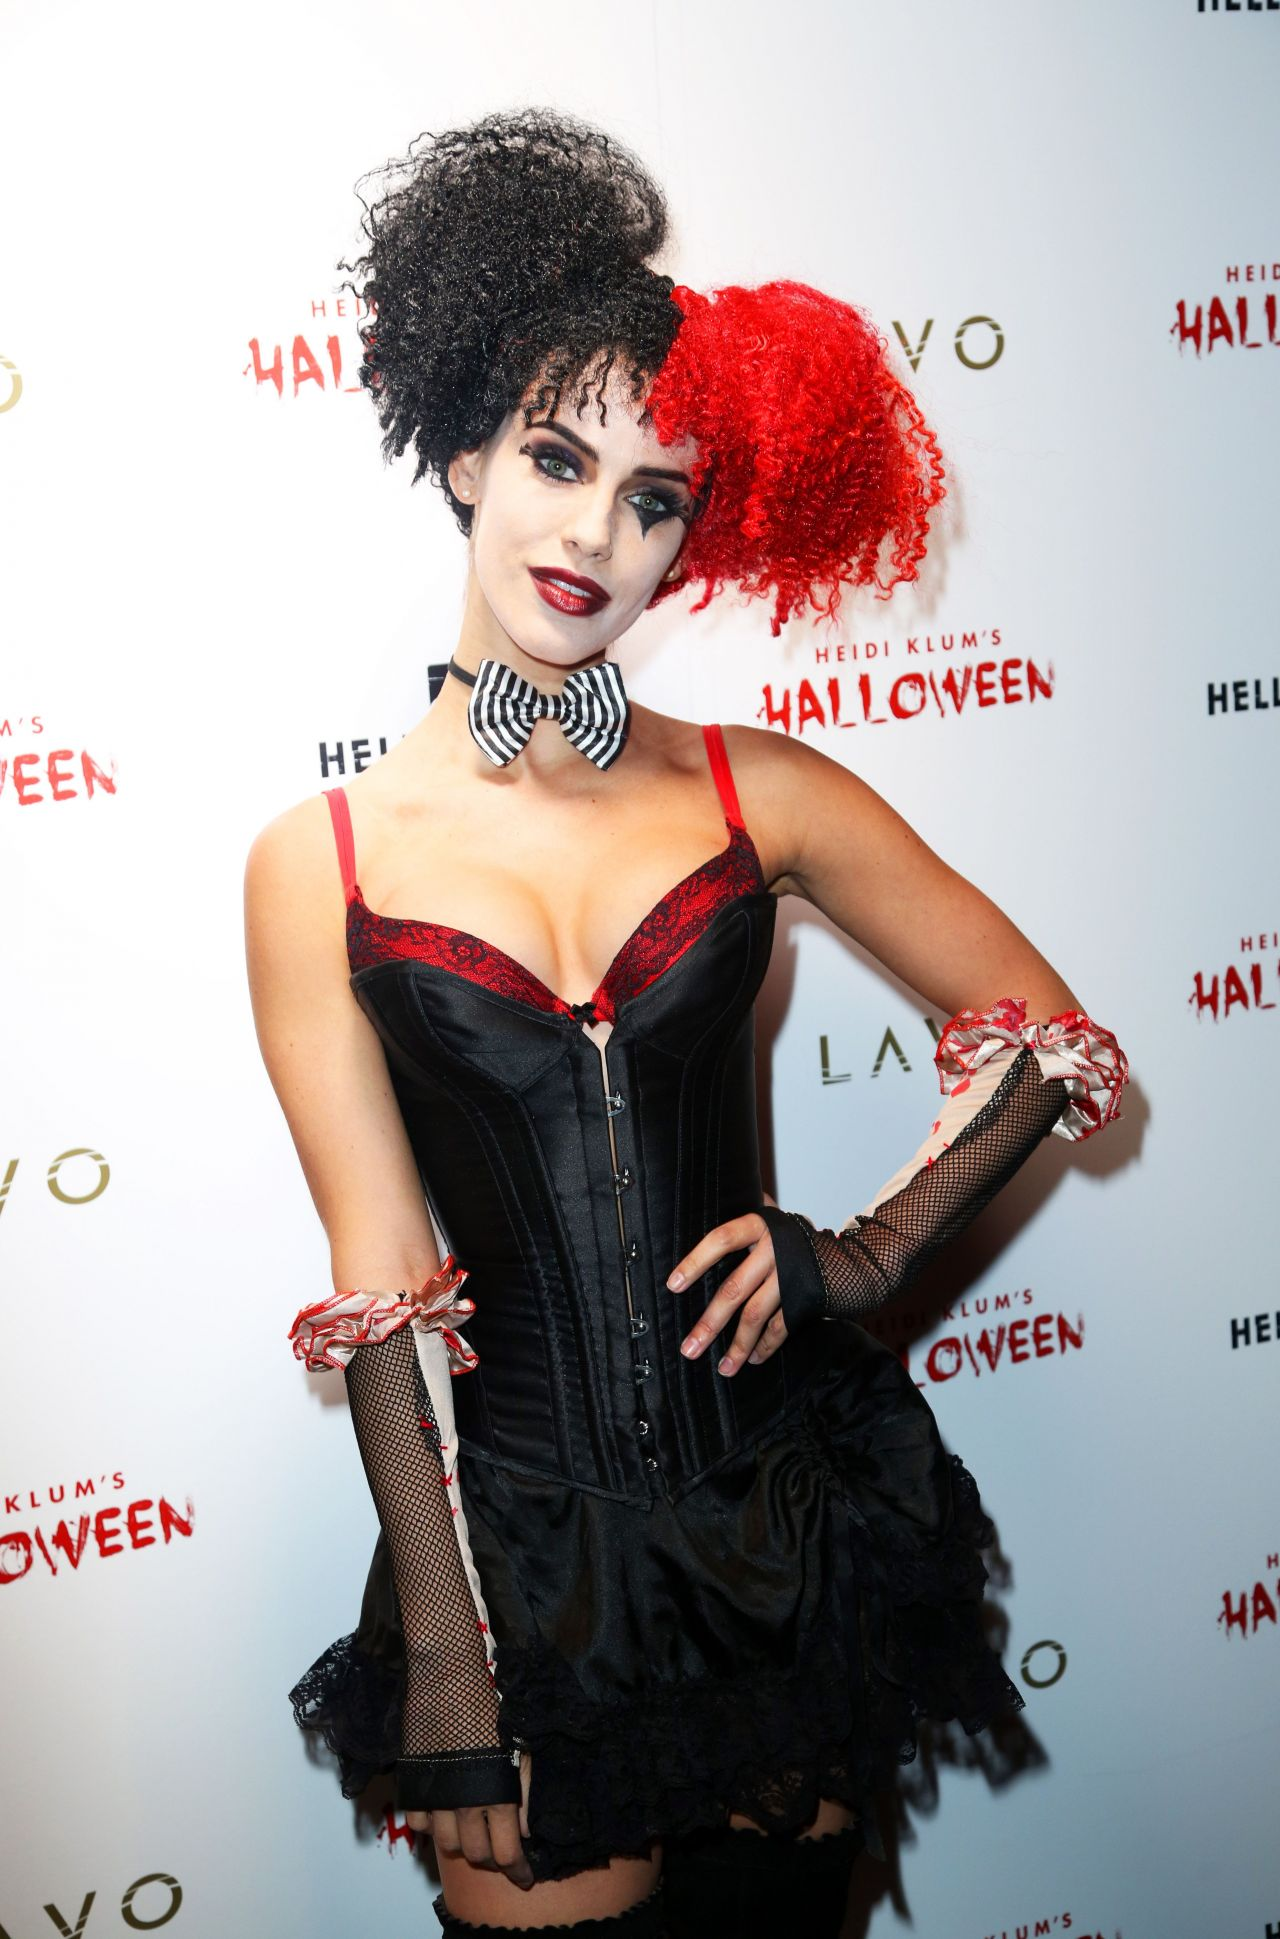 Lowndes – Heidi Klum Halloween Party in New York City, October 2015